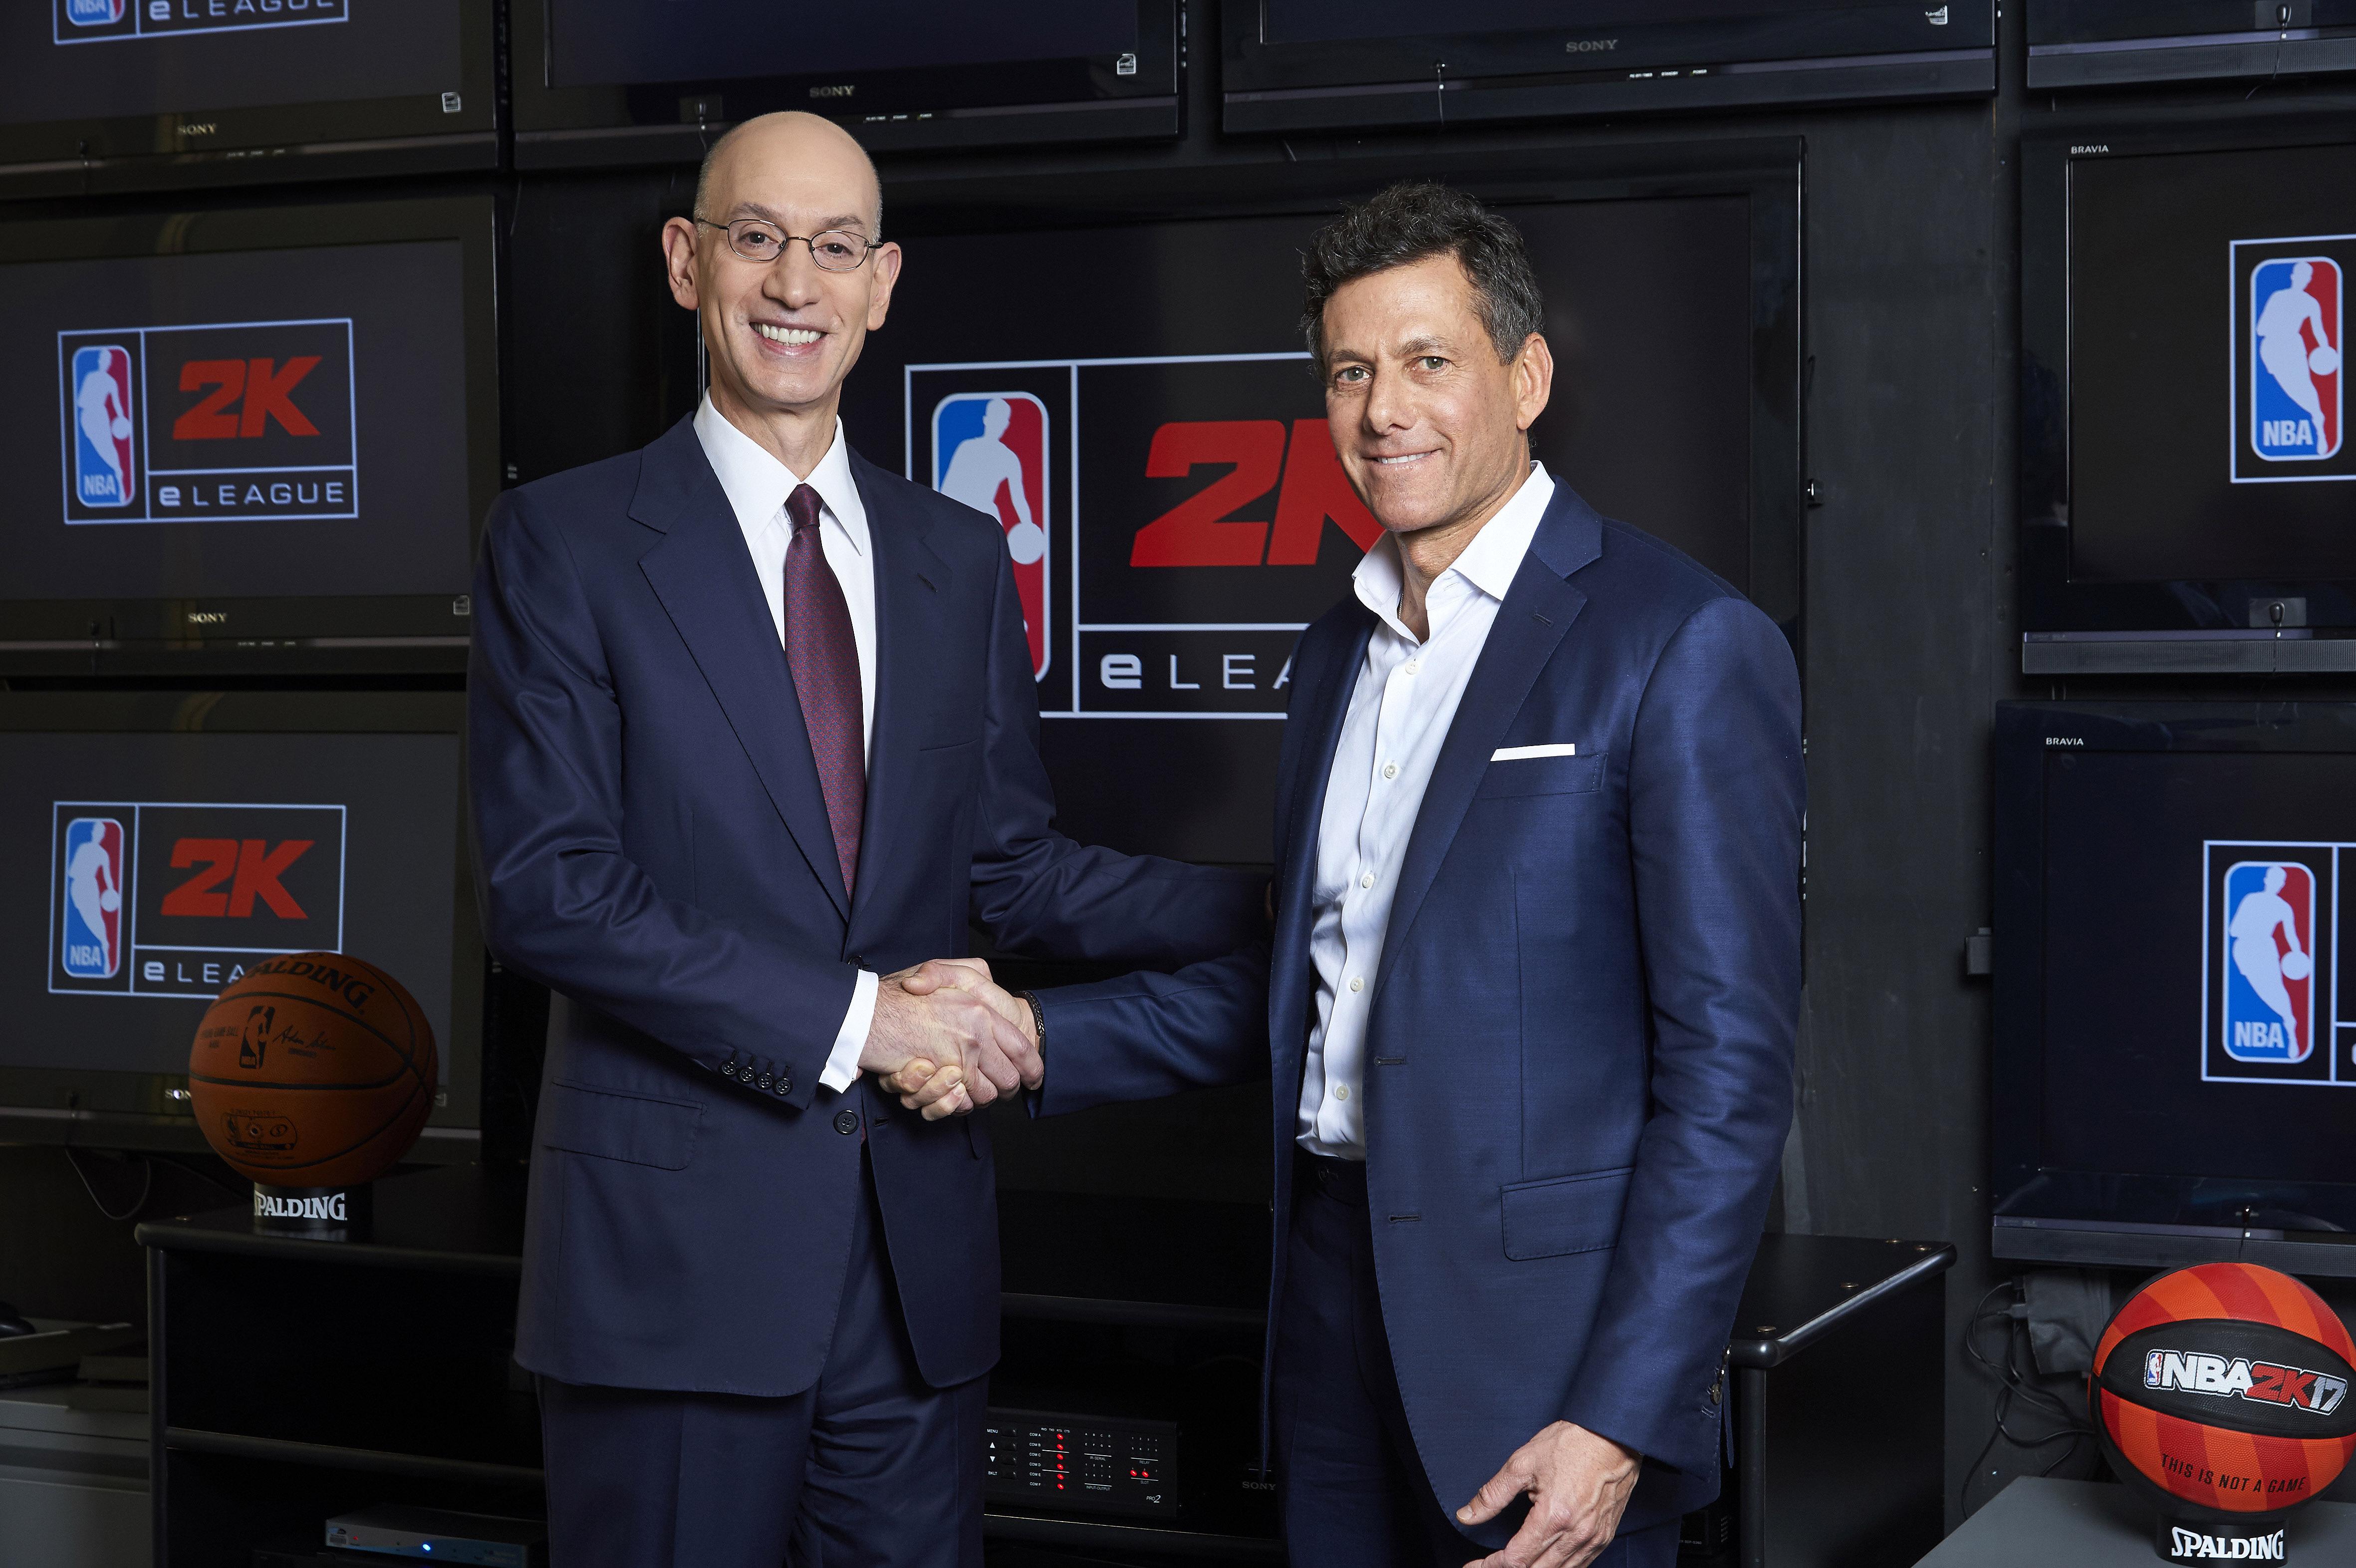 edc34351baa9 Corporate Communications   Public Affairs Alan.Lewis take2games.com or. NBA  Chris Legentil